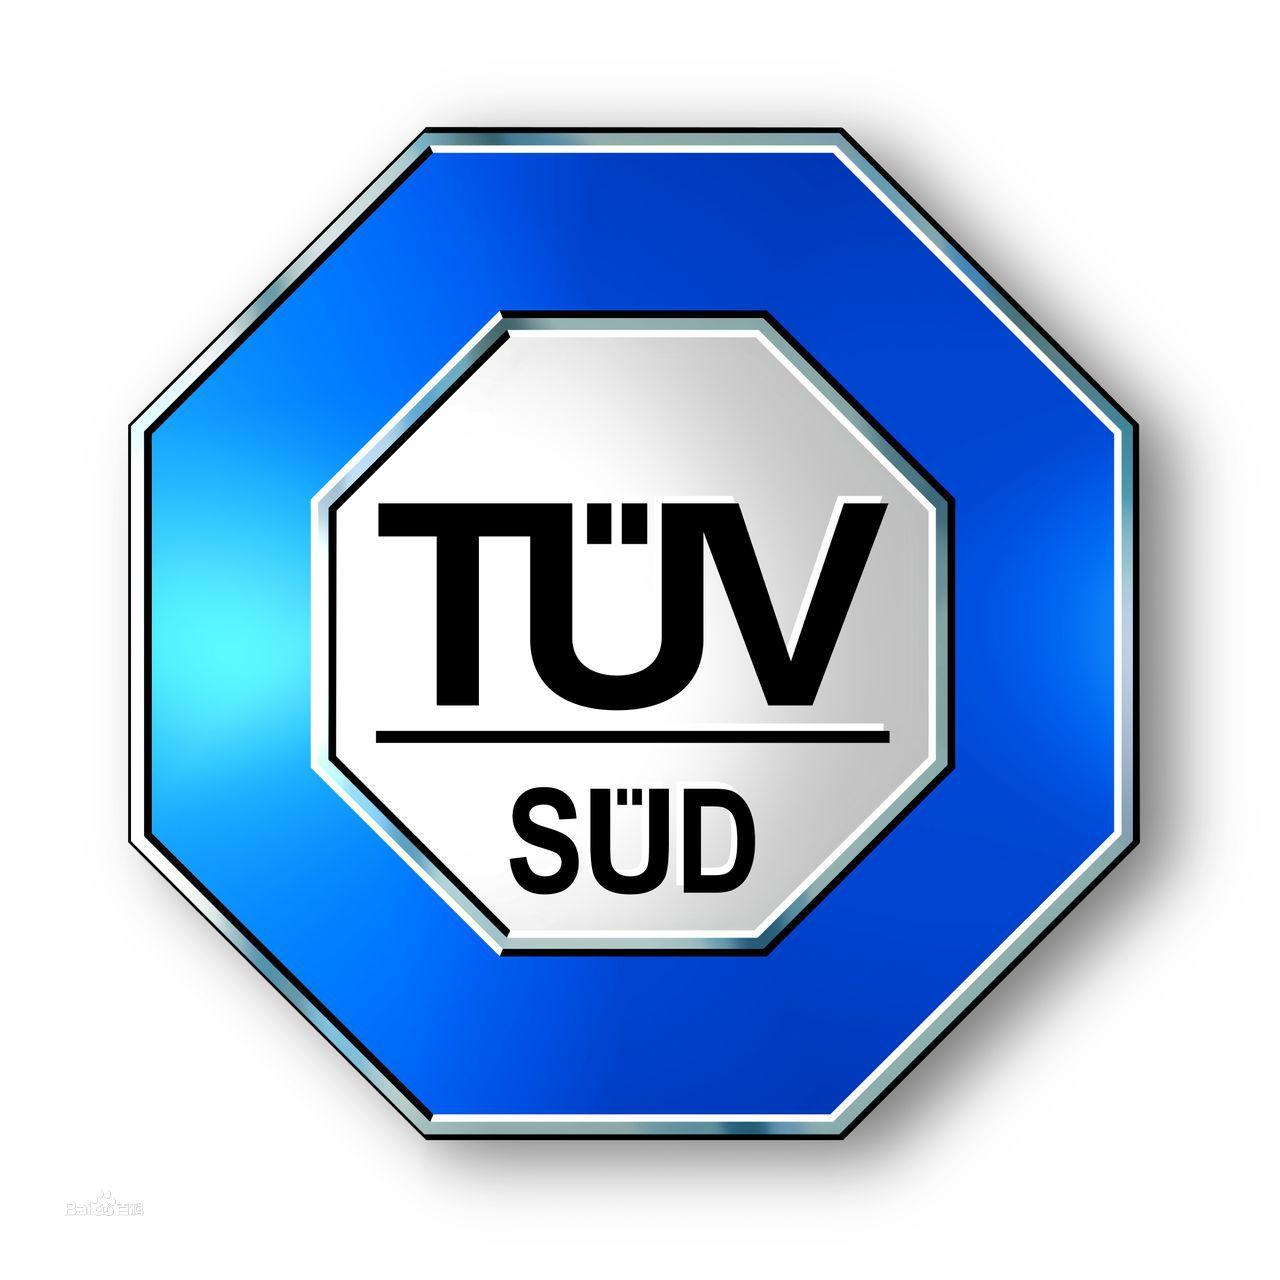 TUV南德商标